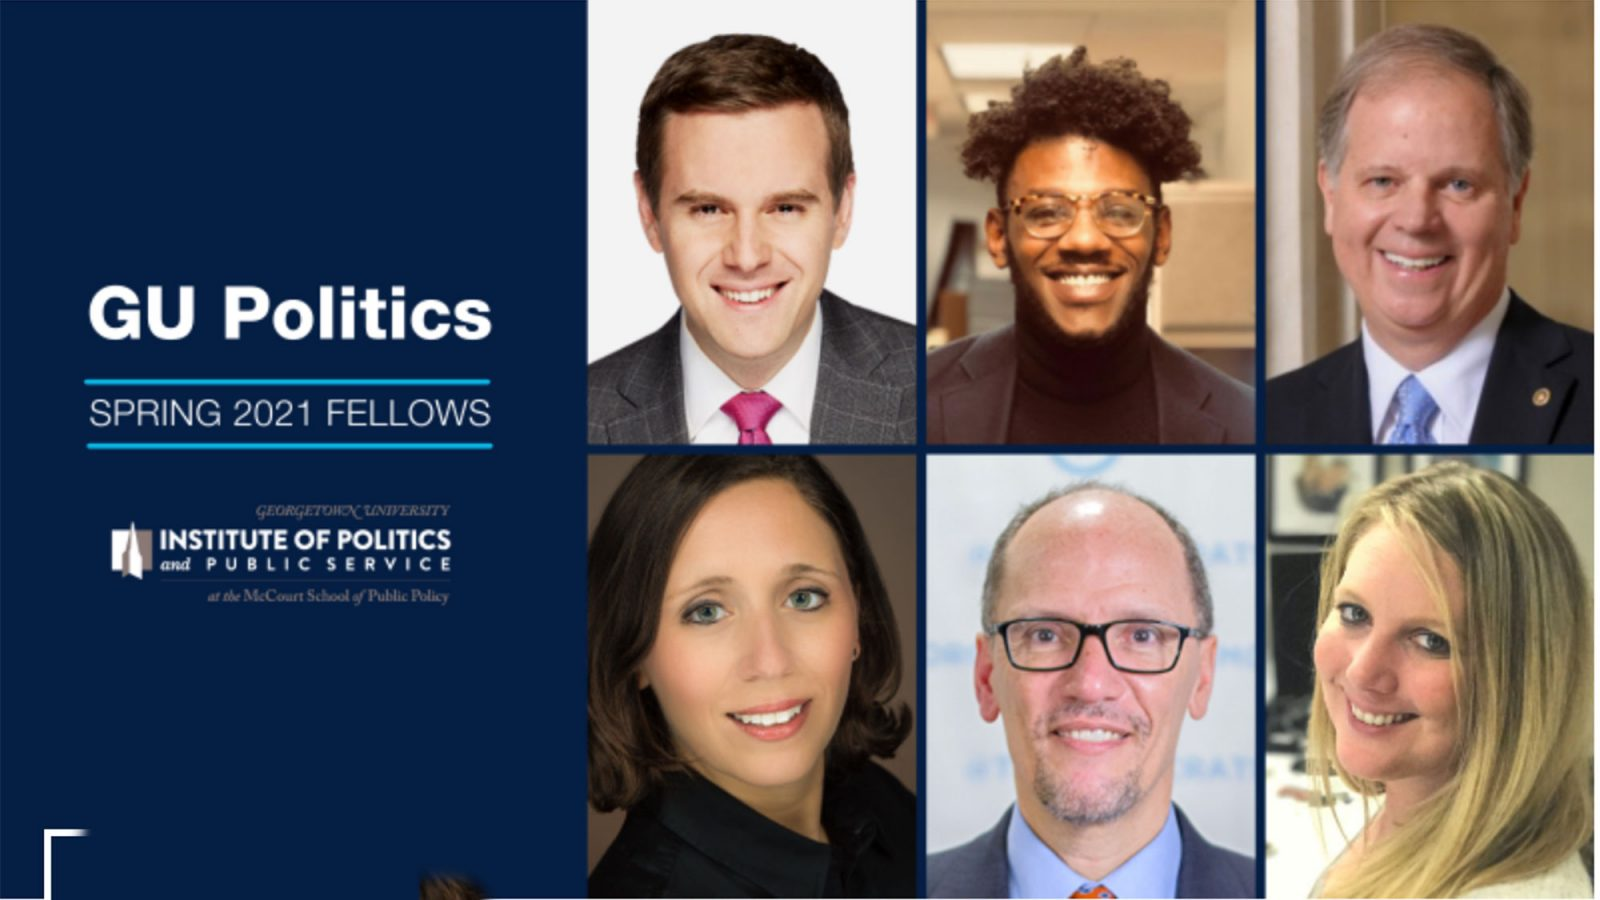 A blue graphic slide of features six Spring 2021 GU Politics Fellows.